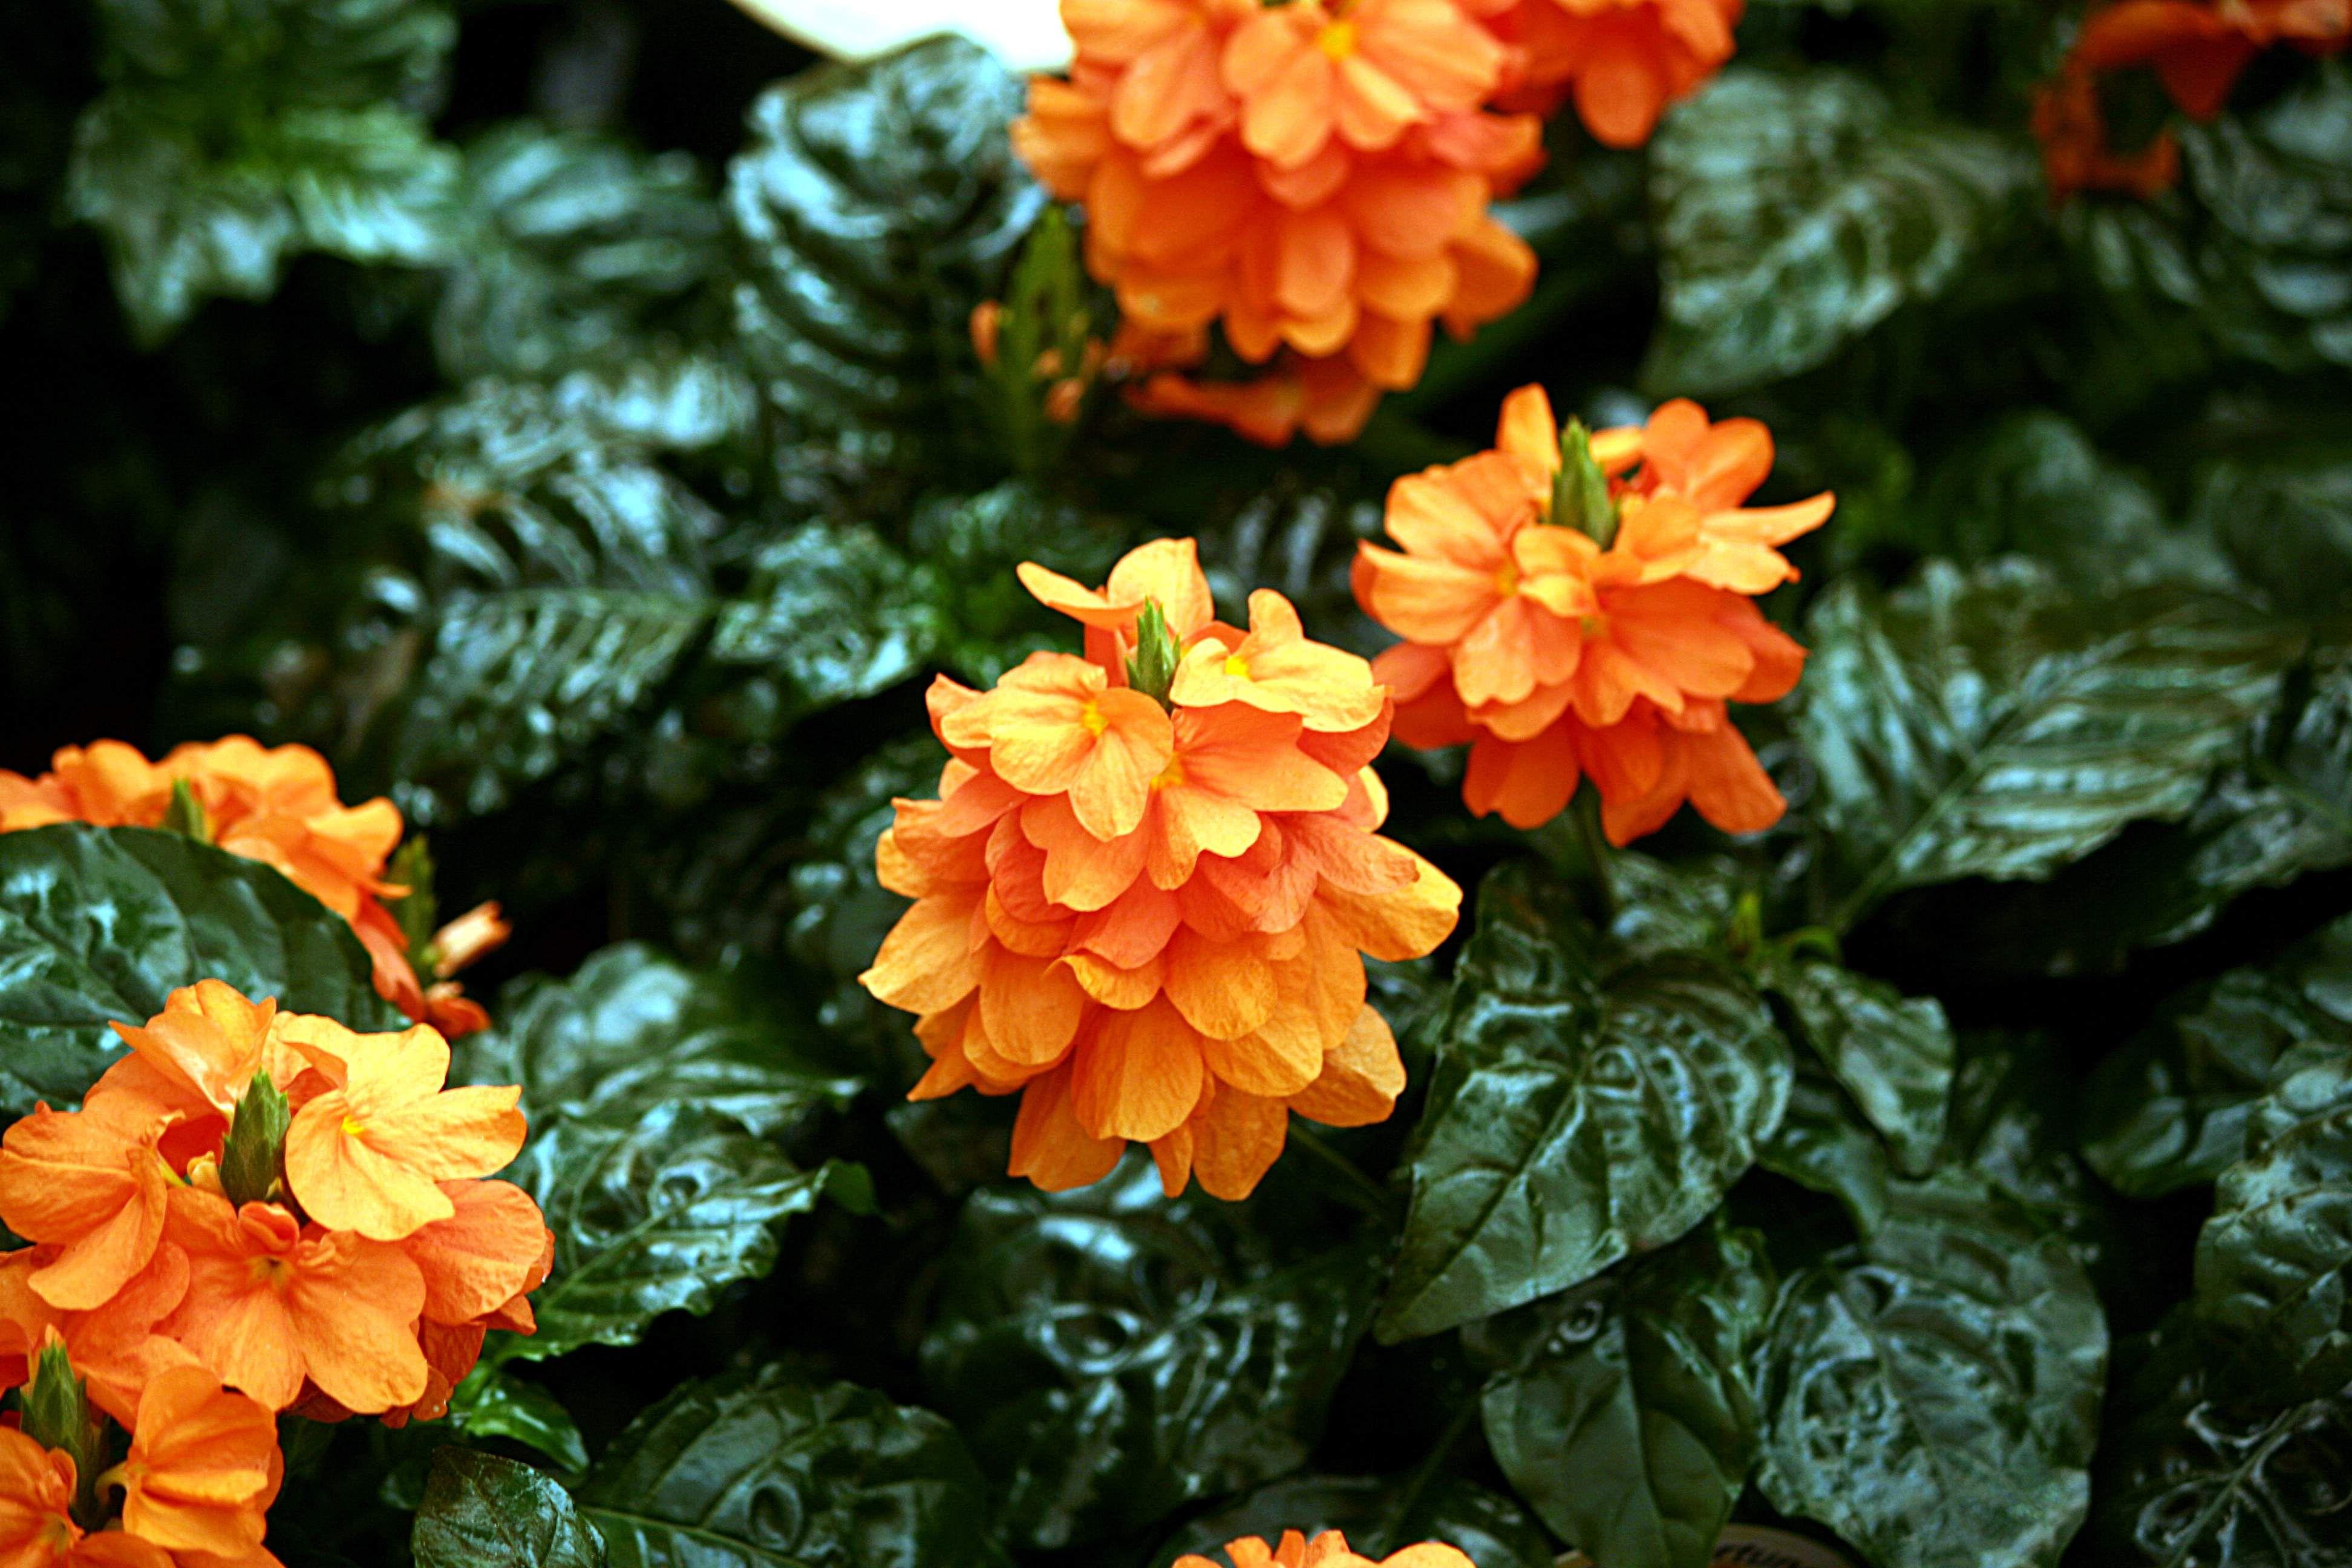 kanakambaram flower, Sounth Indian garden (With images